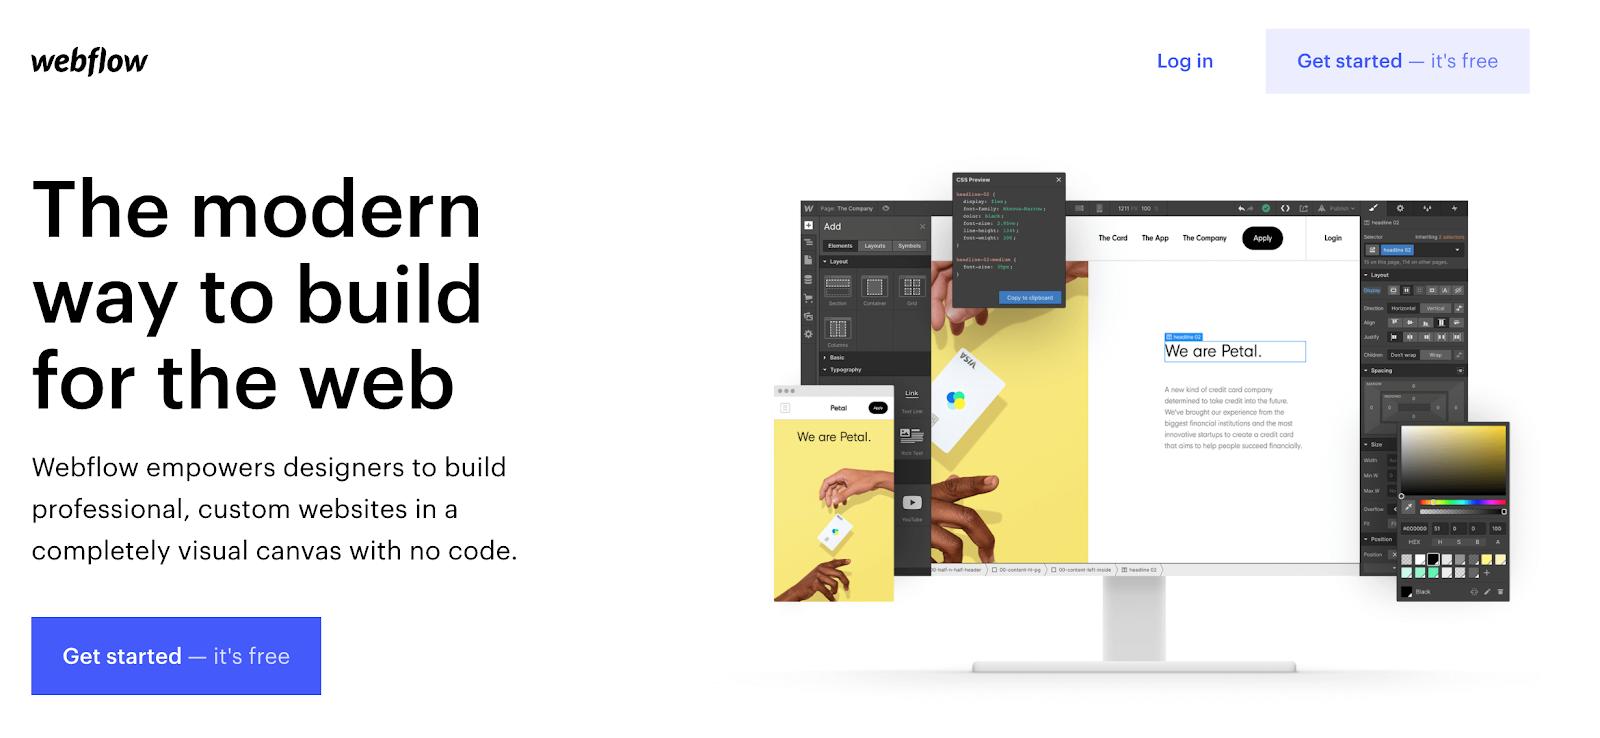 webflow: a squarespace alternative